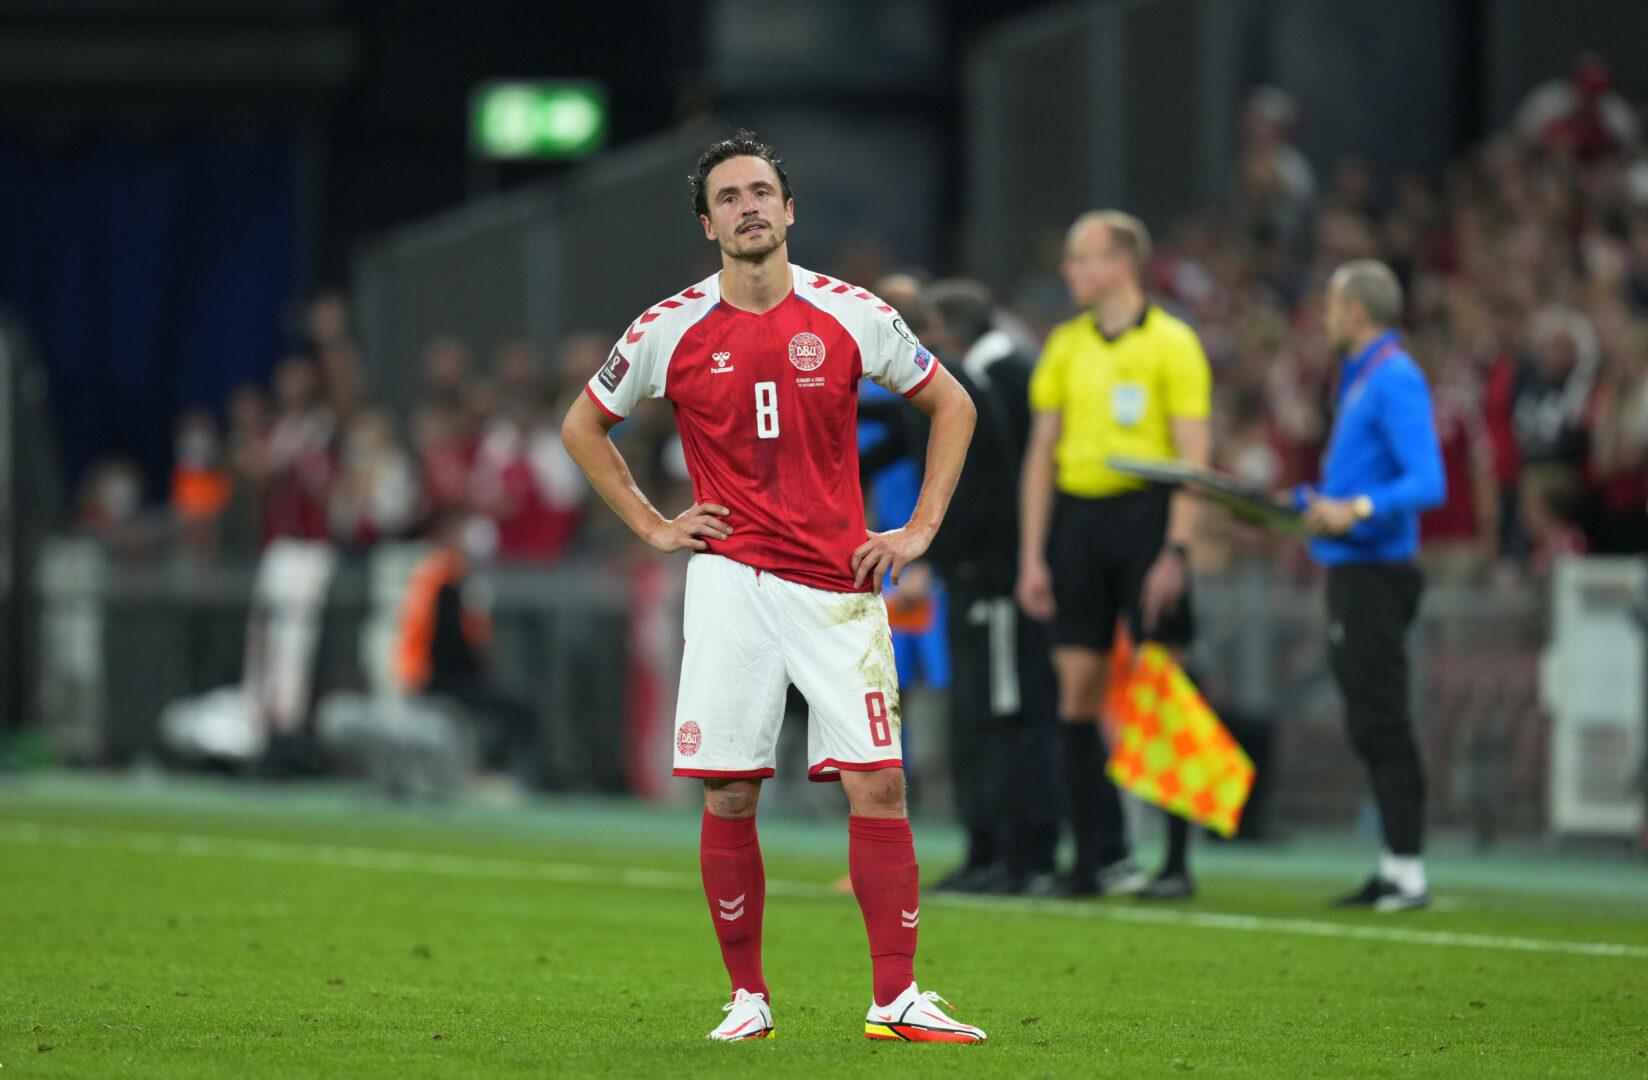 Delaney BVB Dänemark schaut frustriert